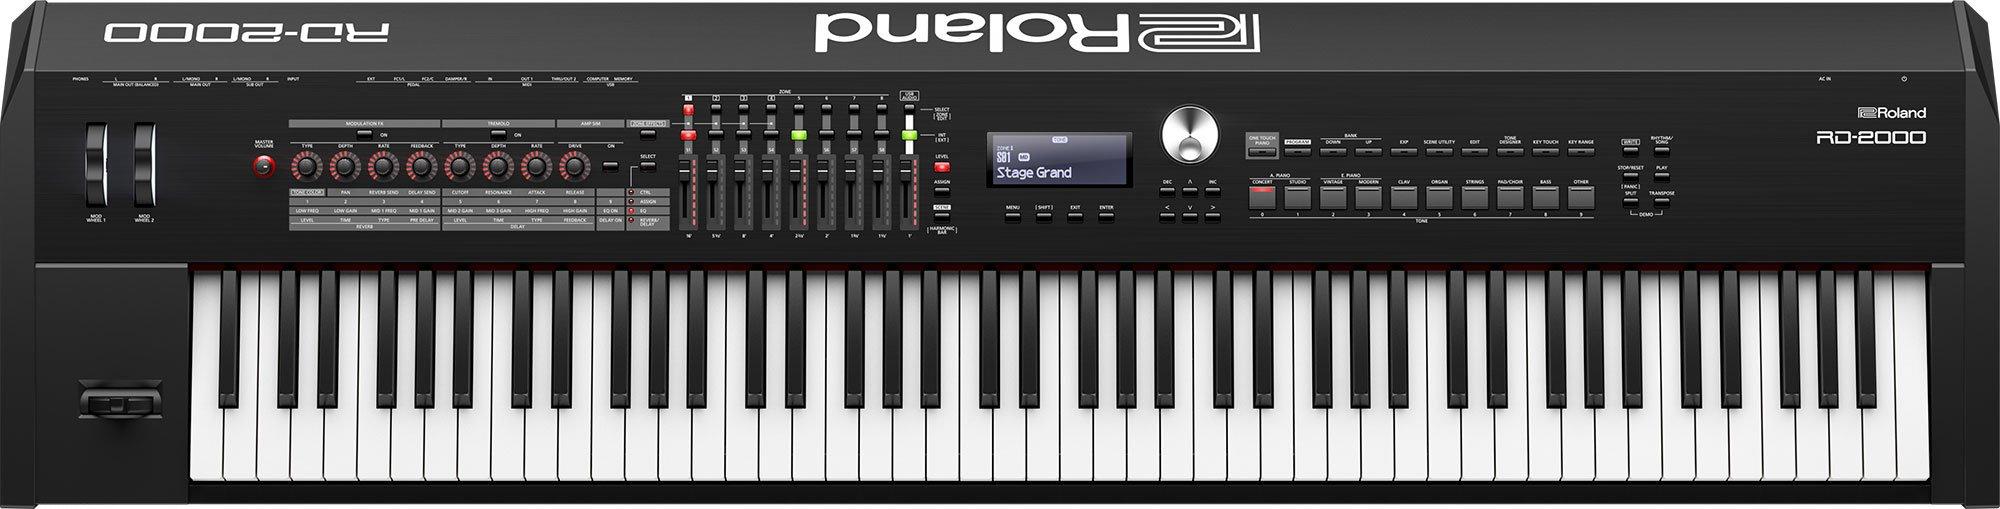 Roland Premium 88-key Digital Stage Piano (RD-2000) by Roland